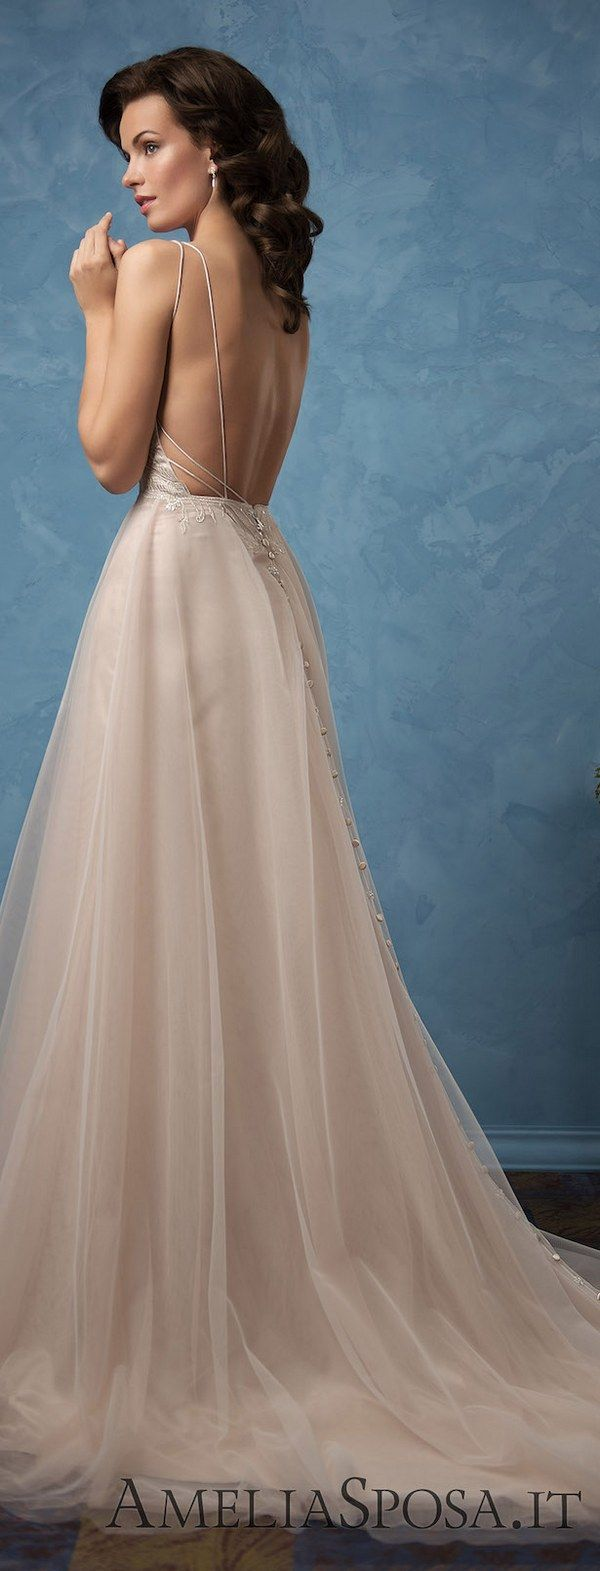 442 best Wedding Dress Inspiration images on Pinterest | Bridal ...